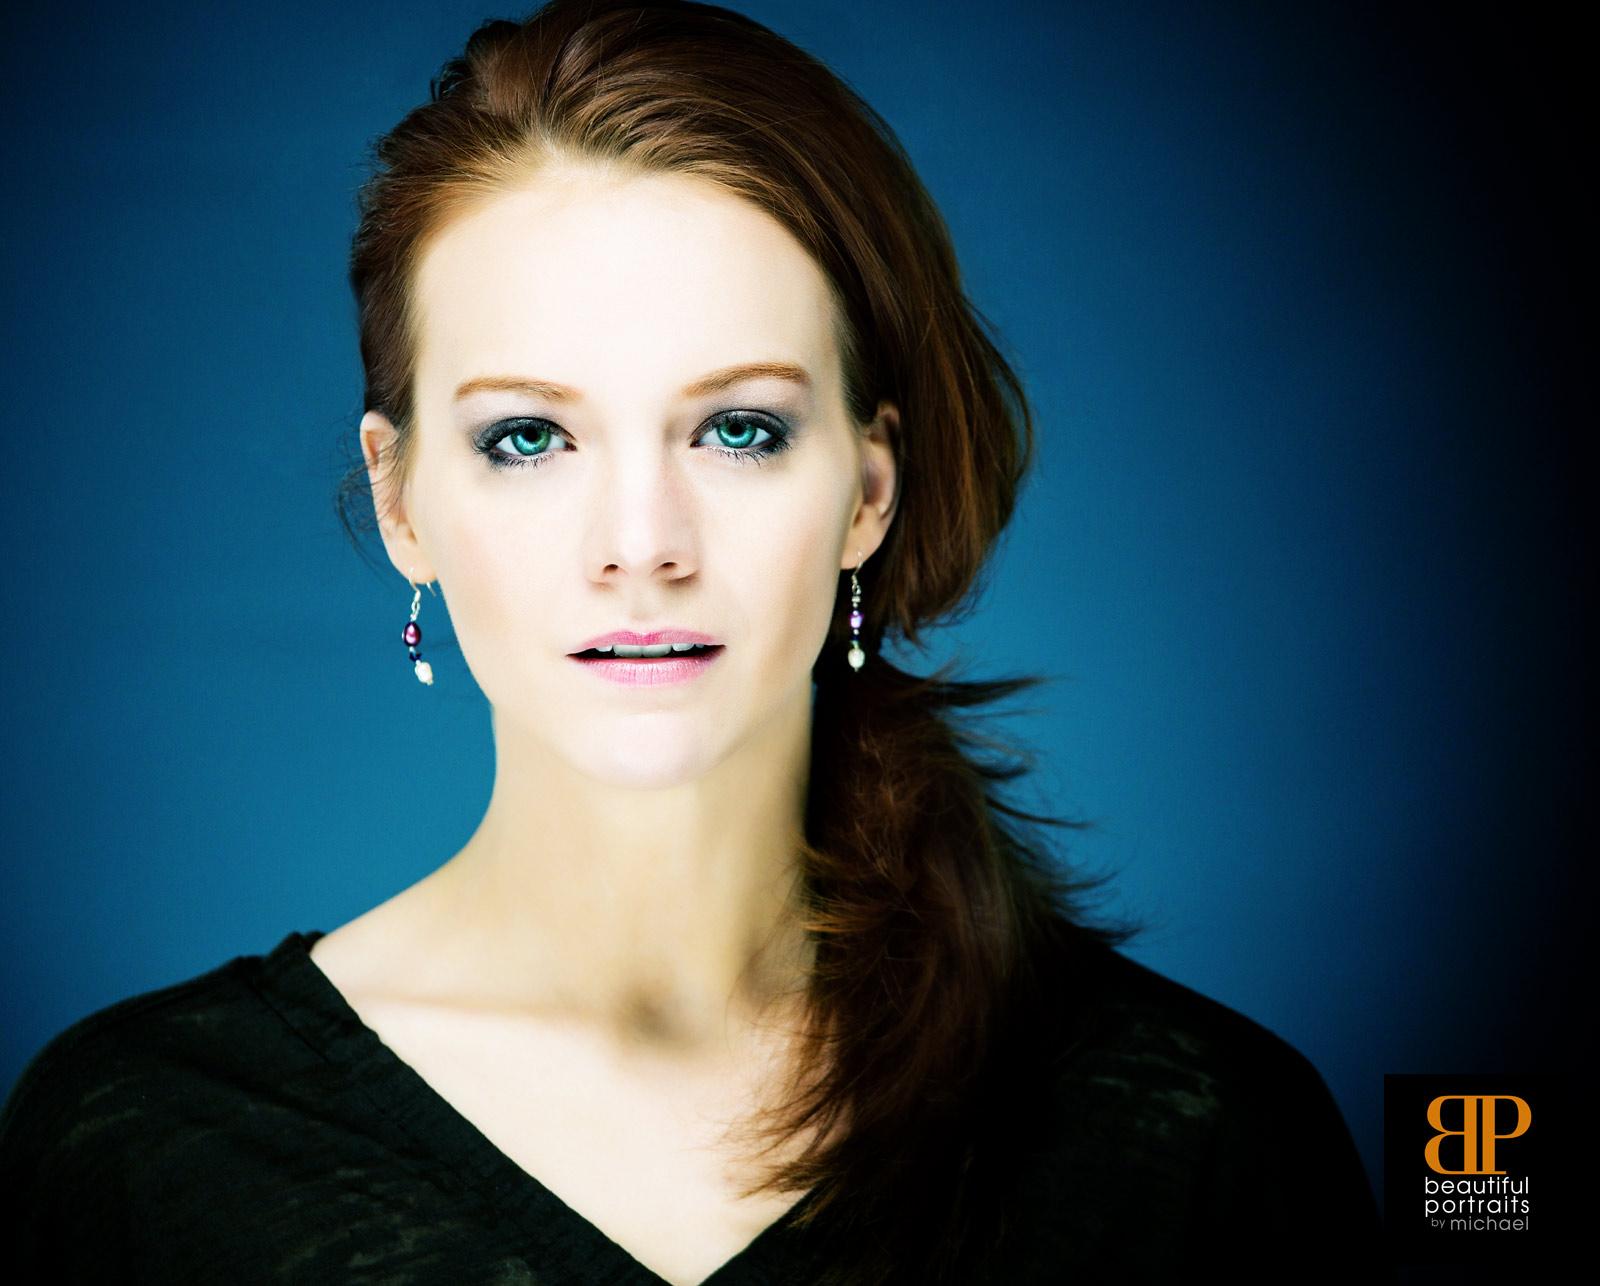 Model: Kj Lyn